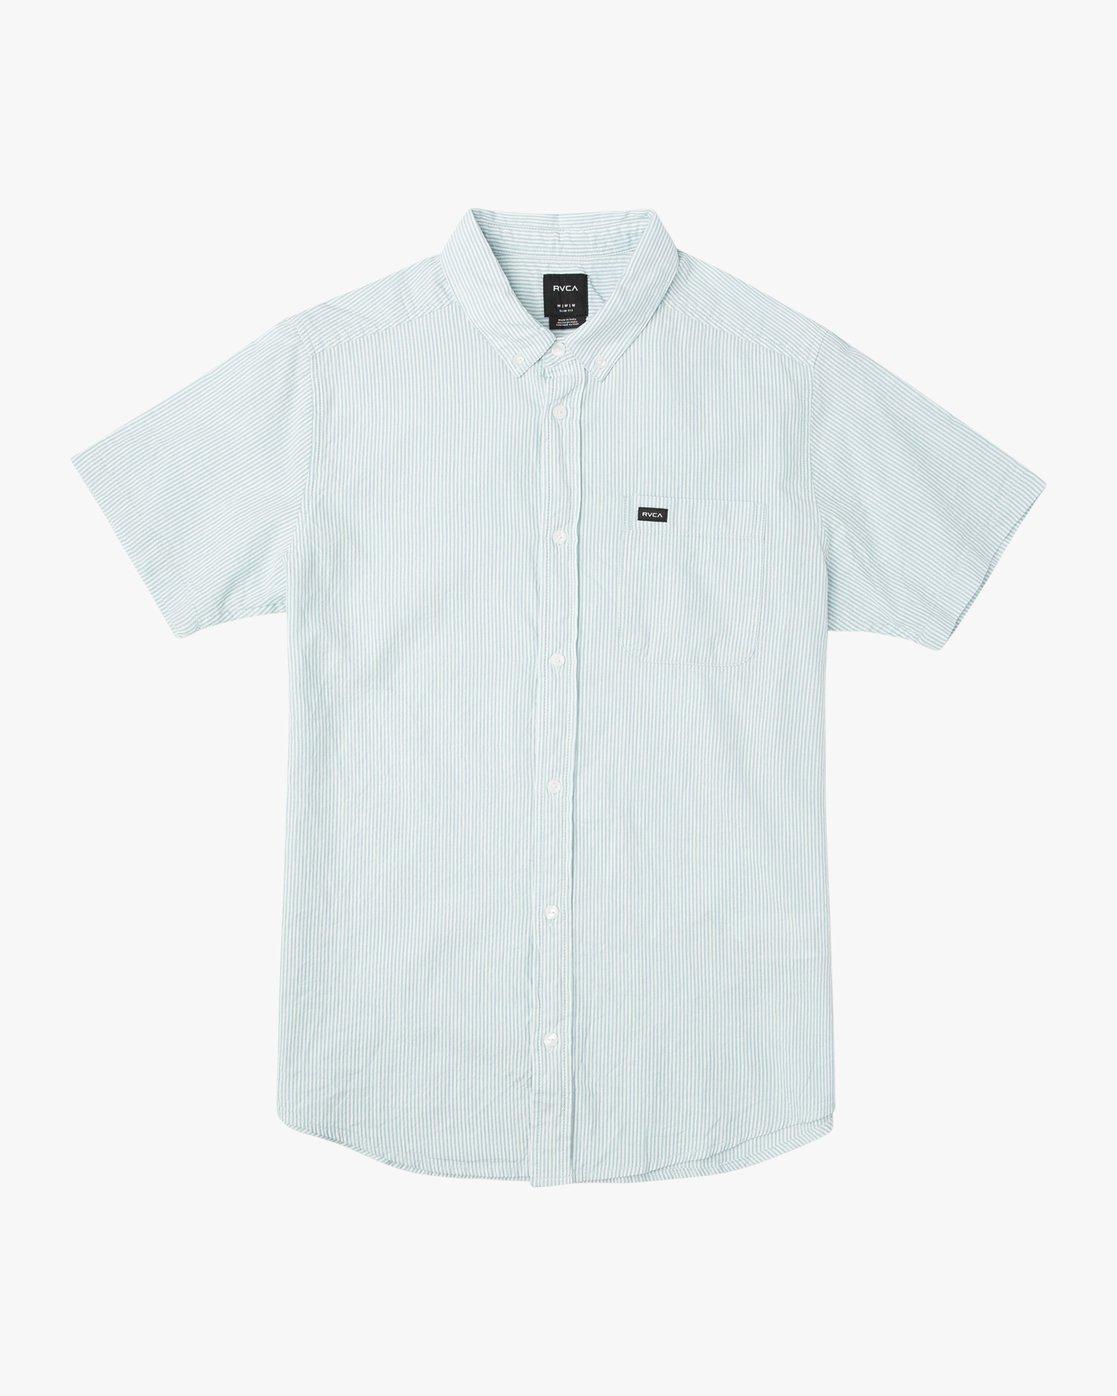 0 Boy's That'll Do Hi Grade II Shirt Blue B552URTH RVCA